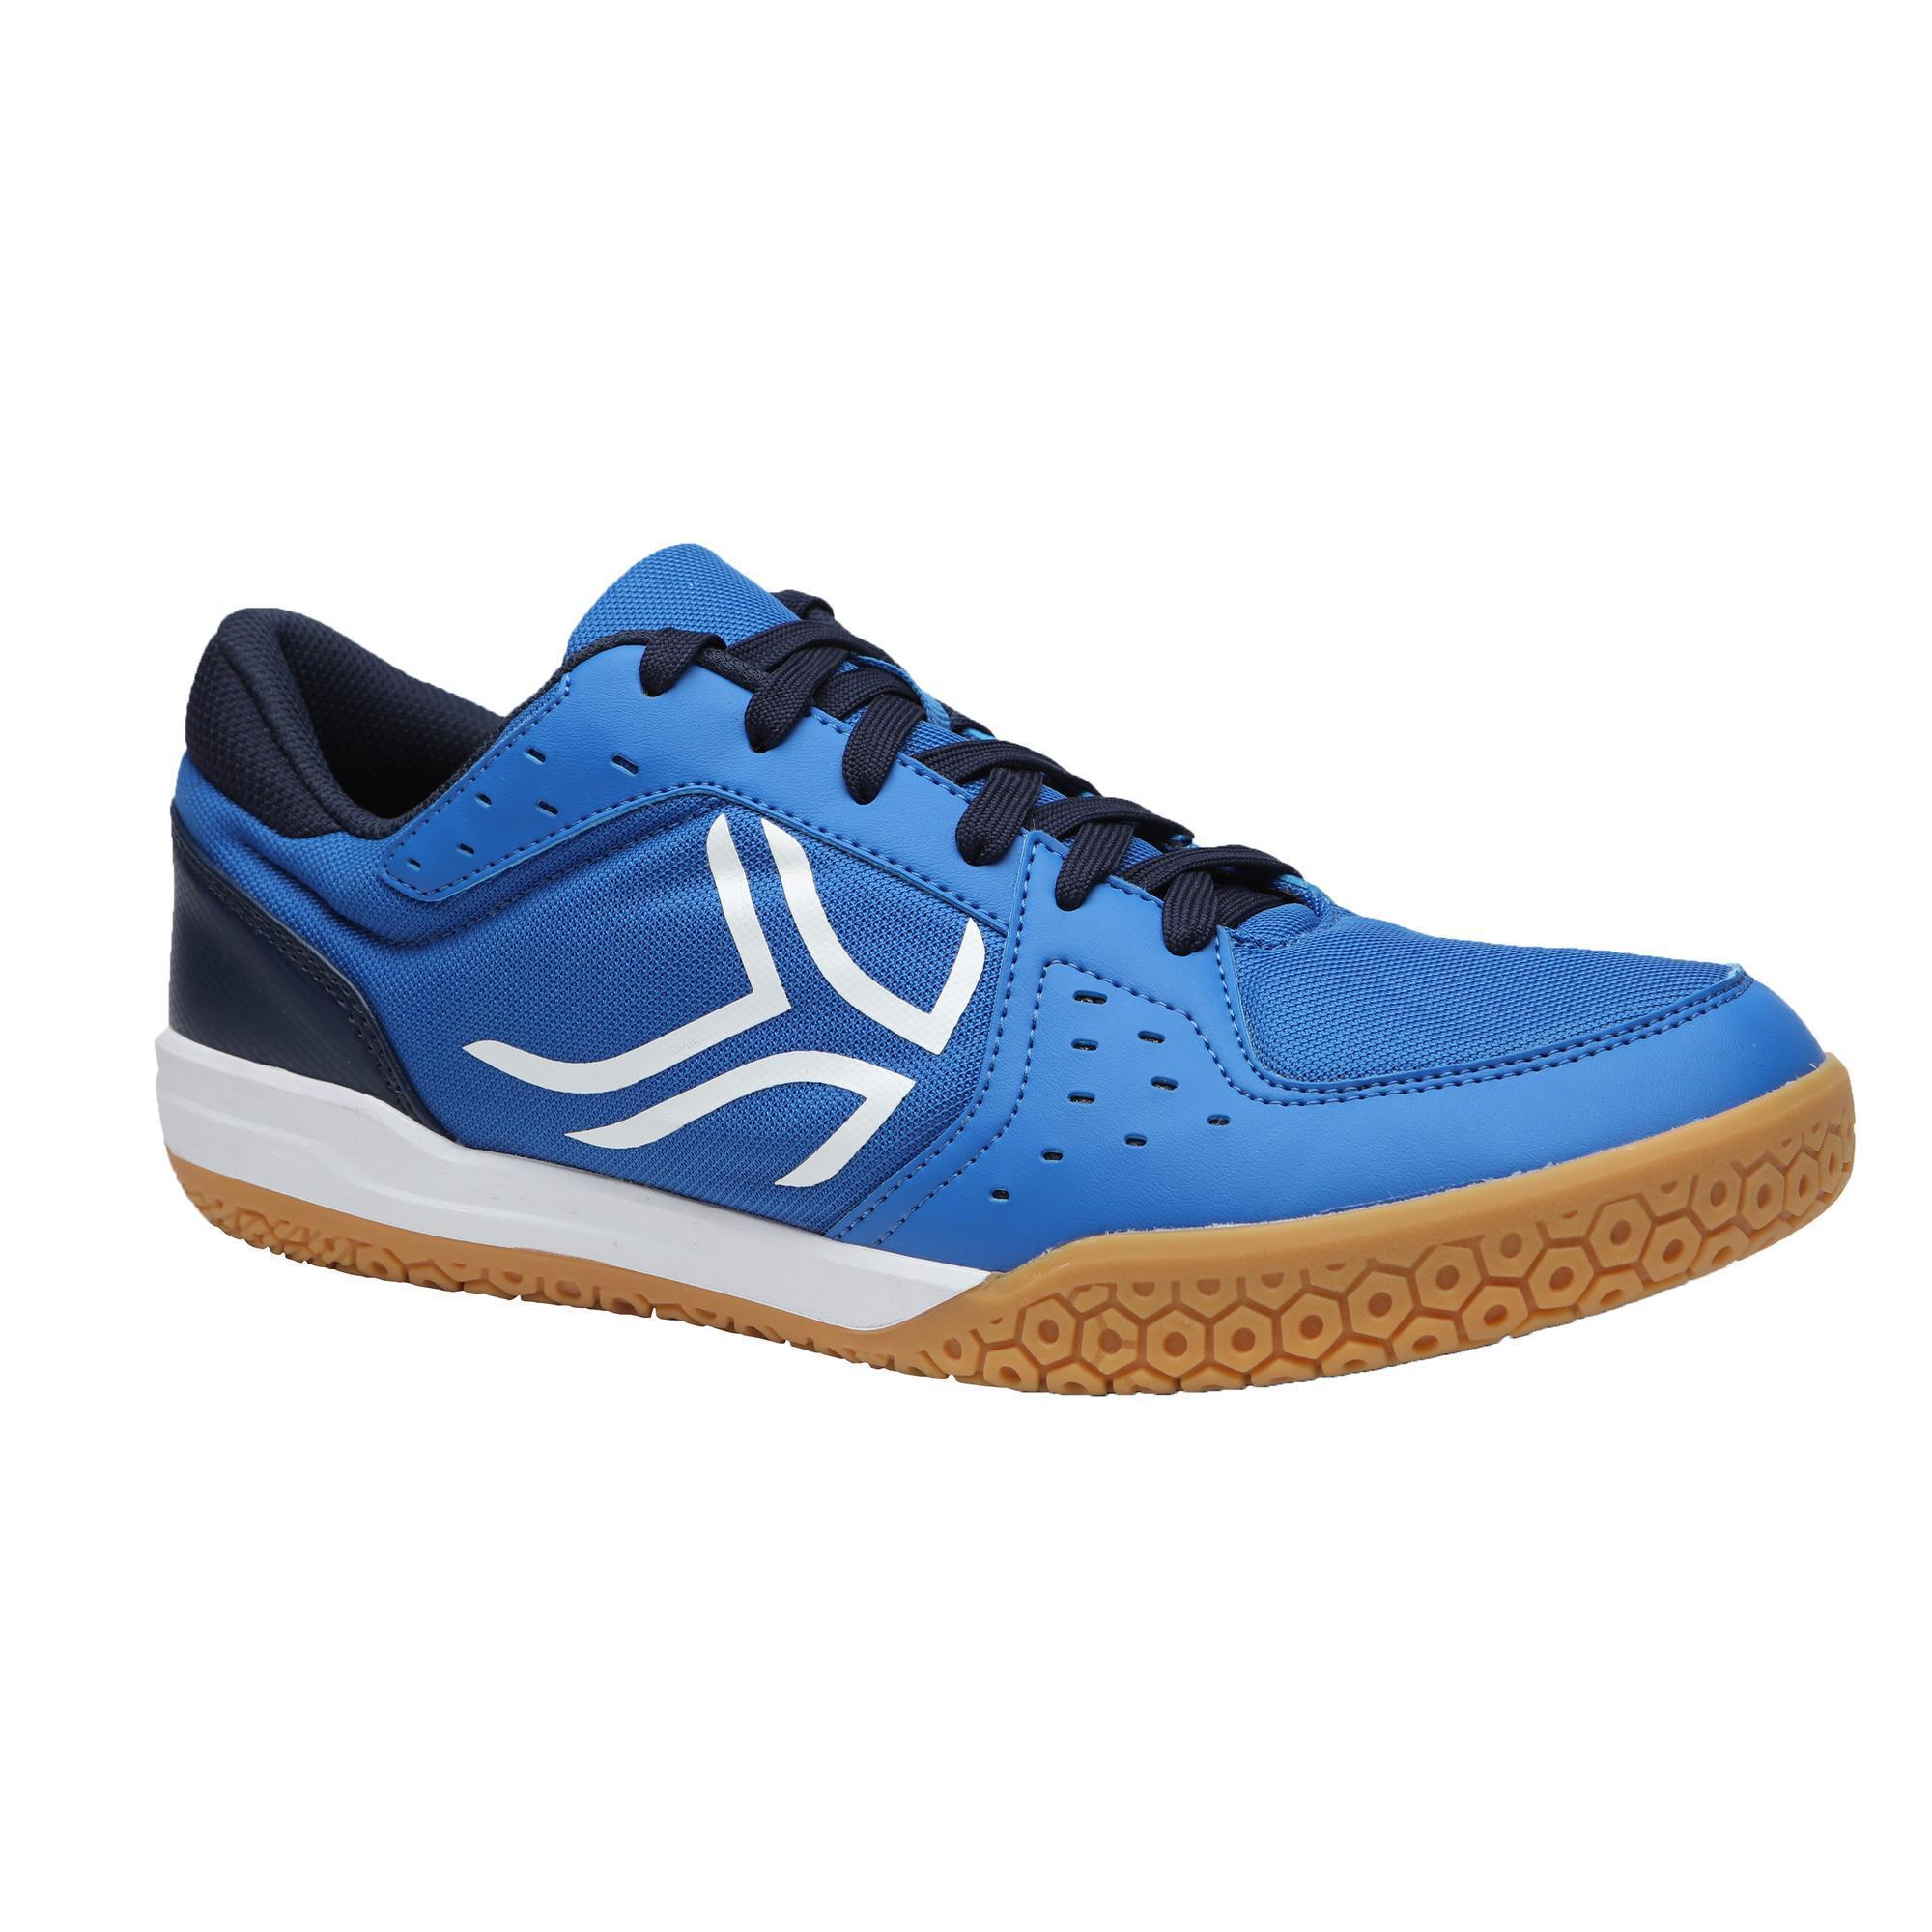 artengo non marking shoes 7dd6b0